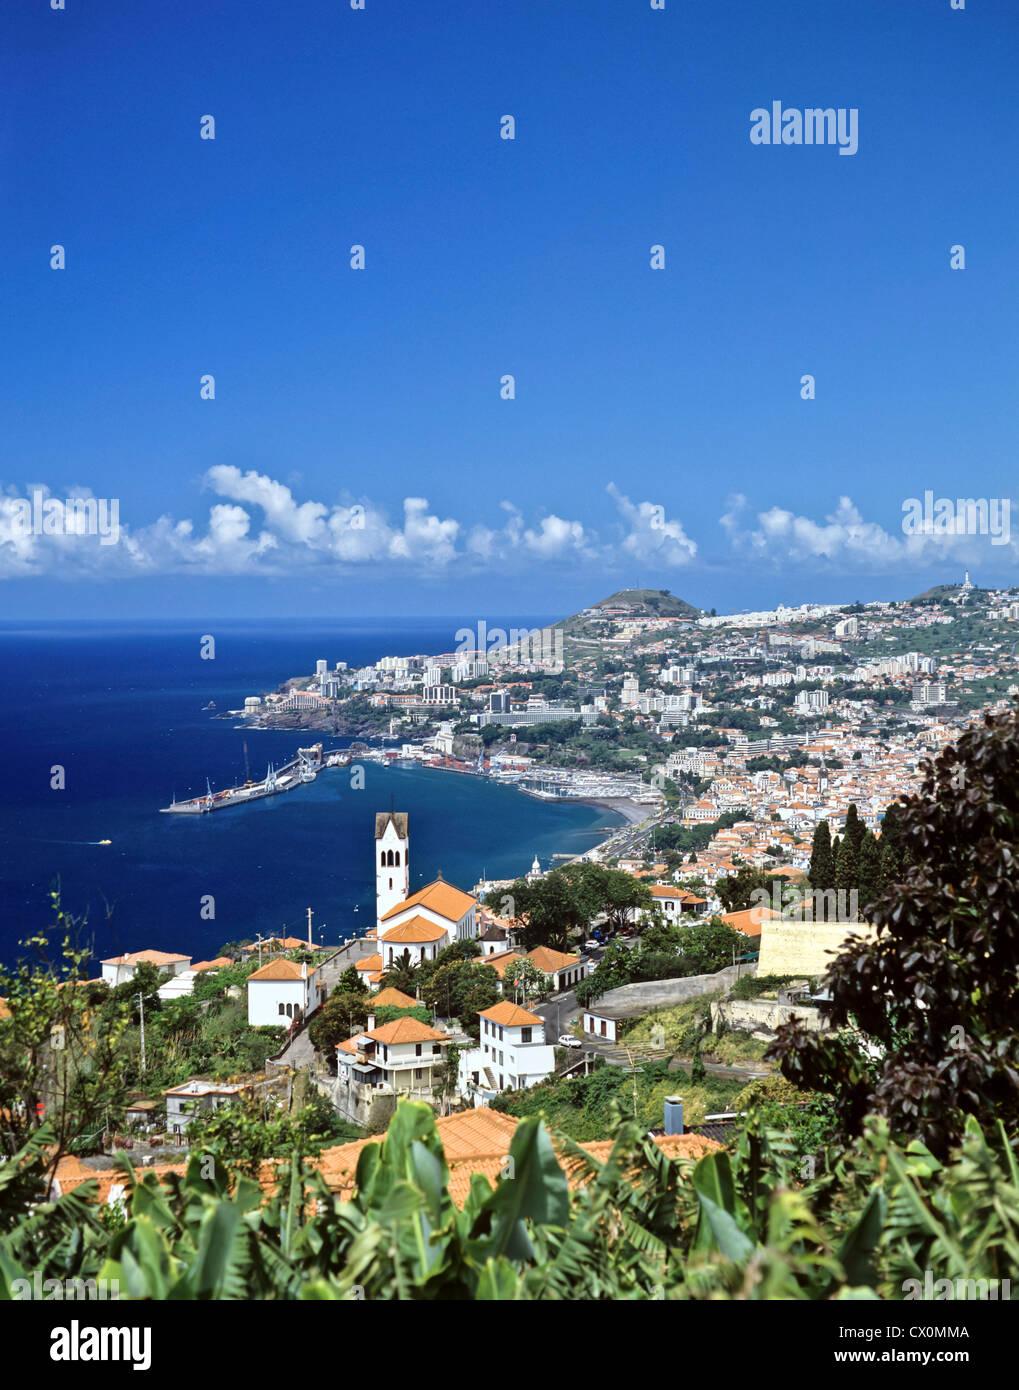 8201. Funchal, Madiera, Europe - Stock Image